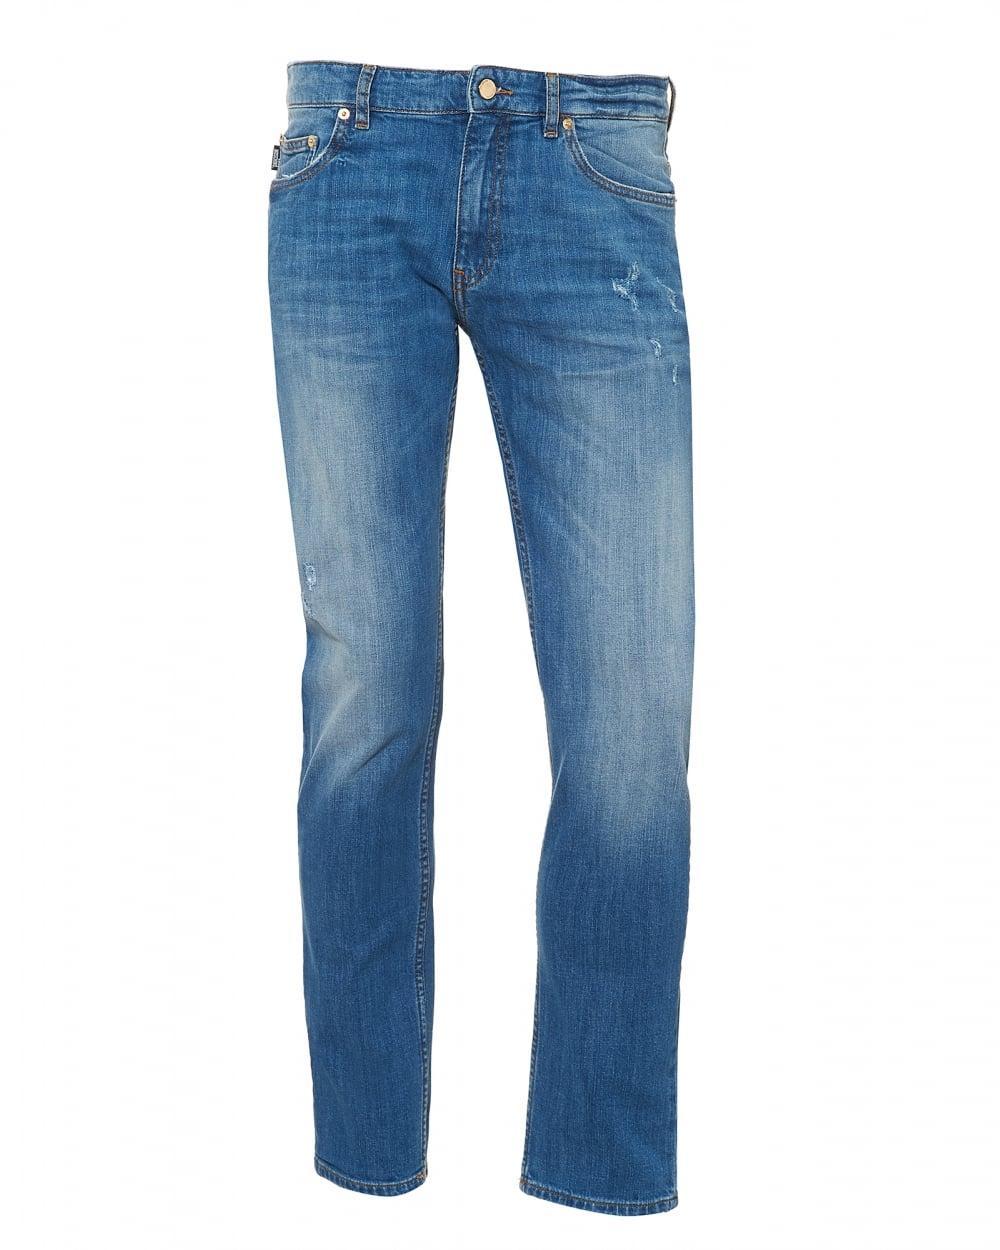 d2c28542 Mens Slim Fit Distressed Jeans, Gold Hardware Light Blue Jeans